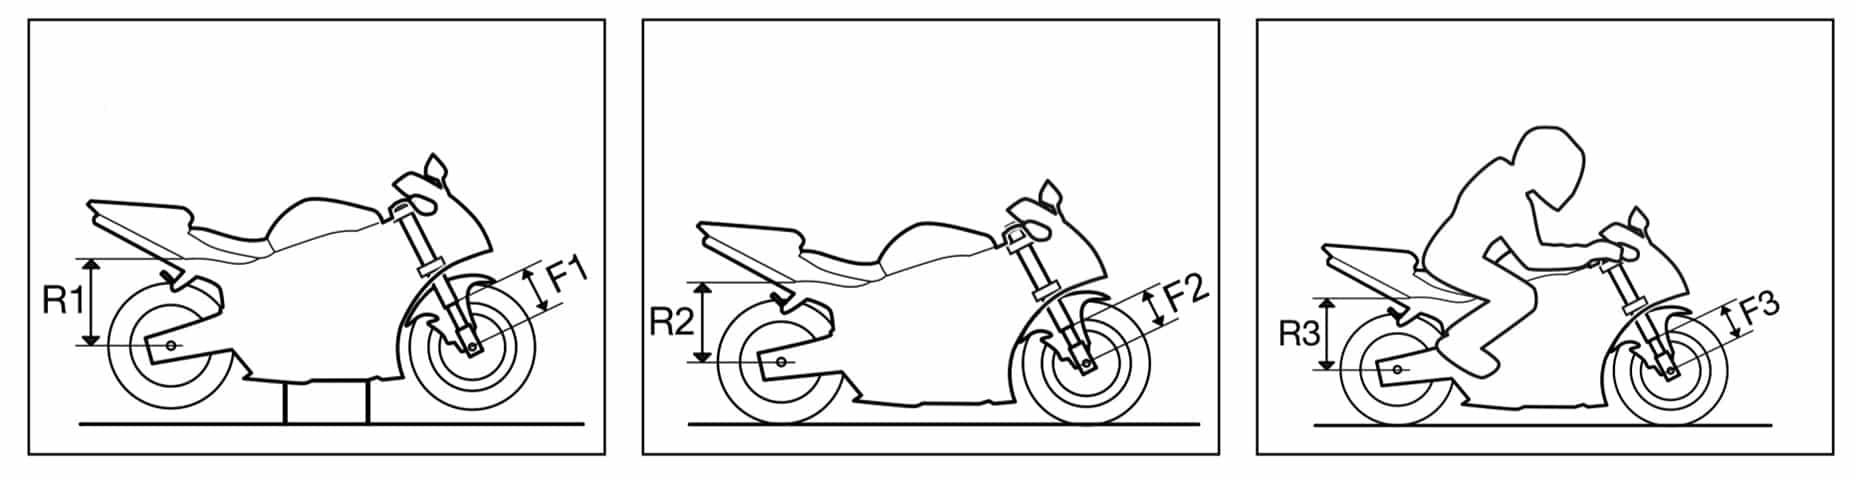 Mediciones del SAG en moto carretera